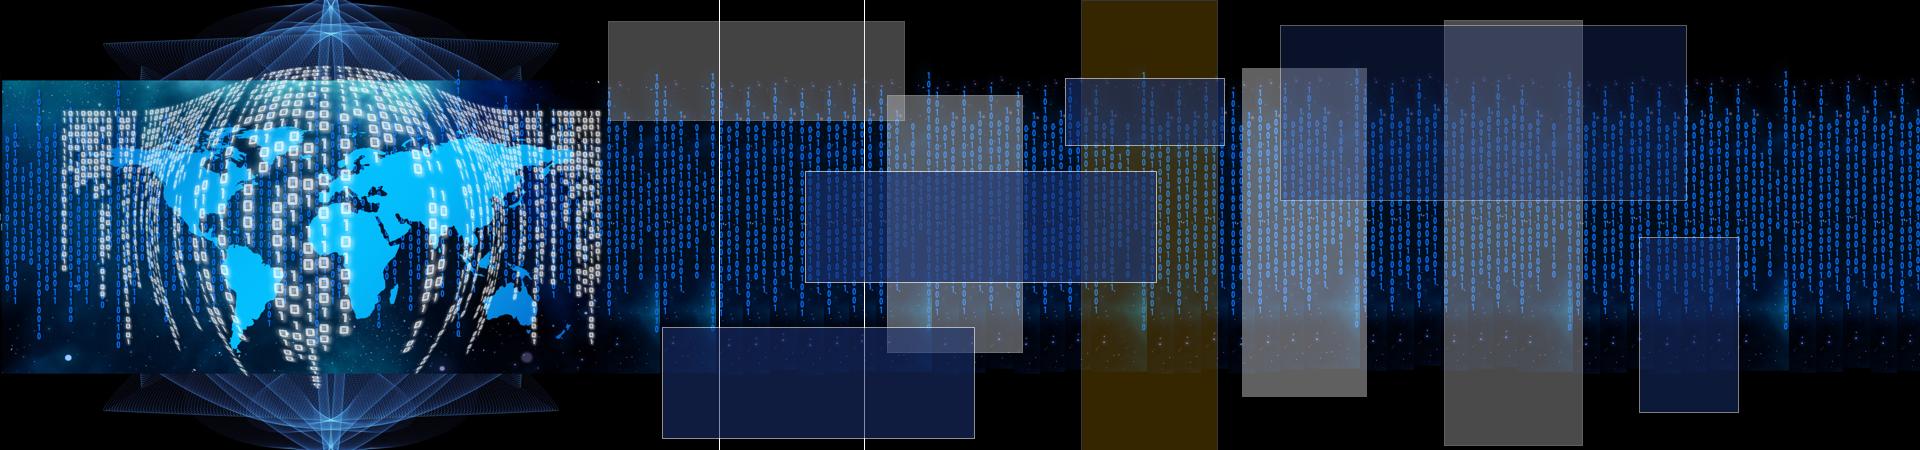 Banner Datenanalyse 1920x450px | SEGNO